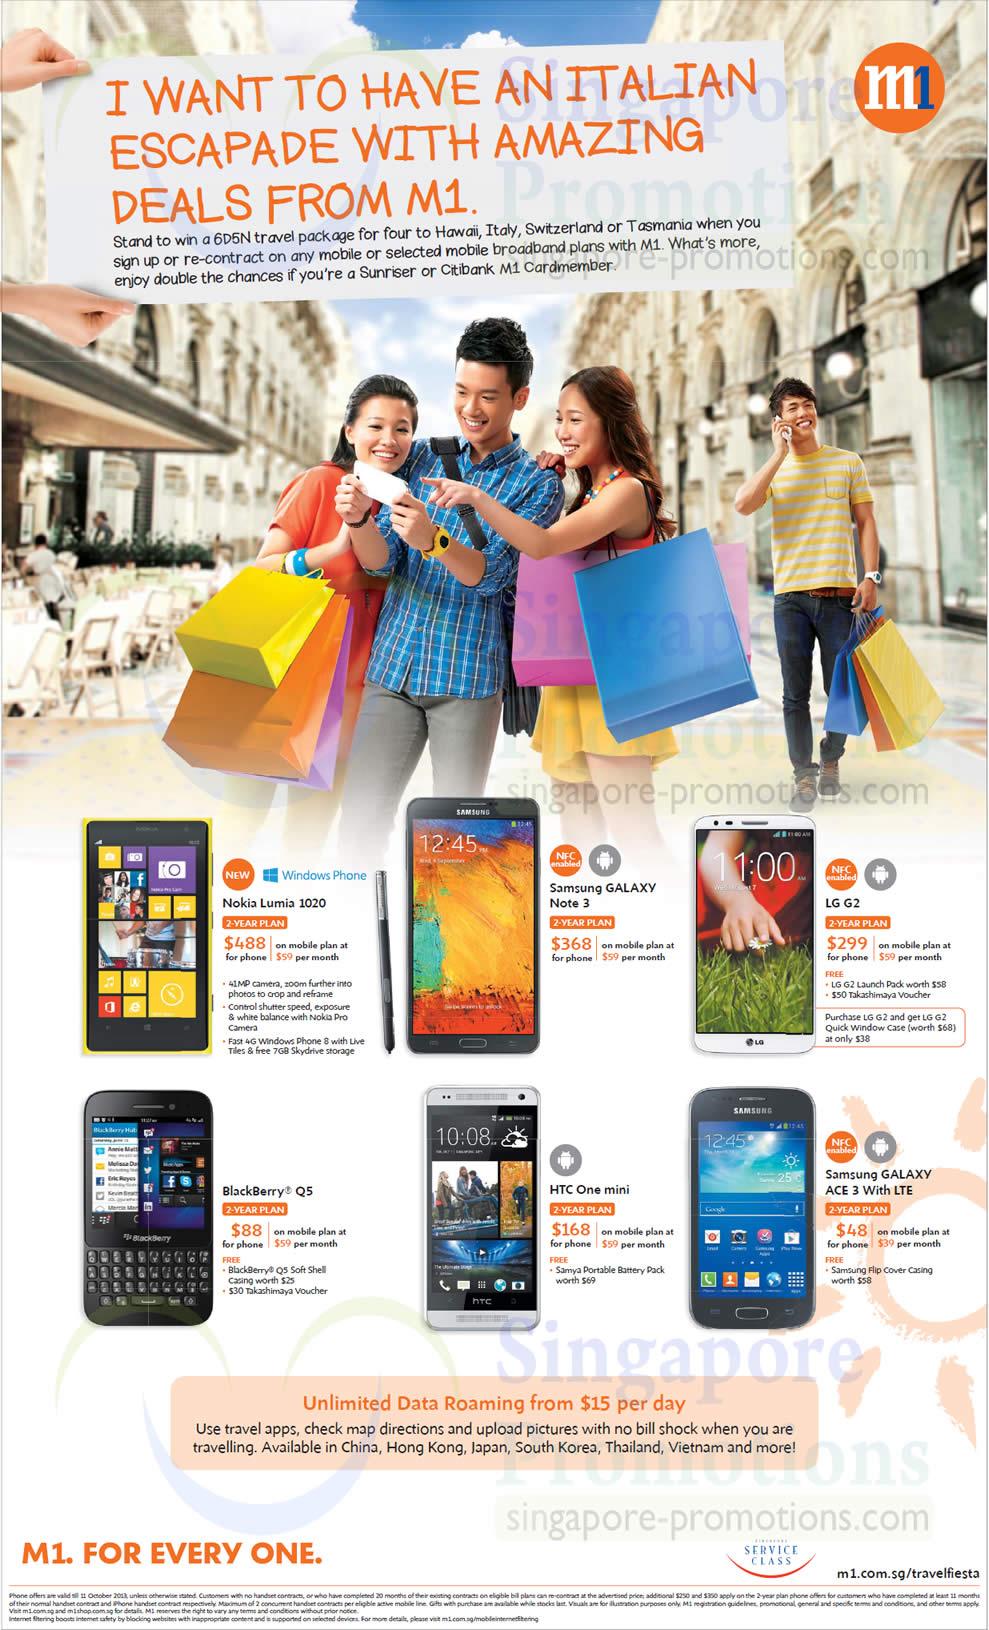 Nokia Lumia 1020, Samsung Galaxy Note 3, Ace 3, LG G2, Blackberry Q5, HTC One Mini